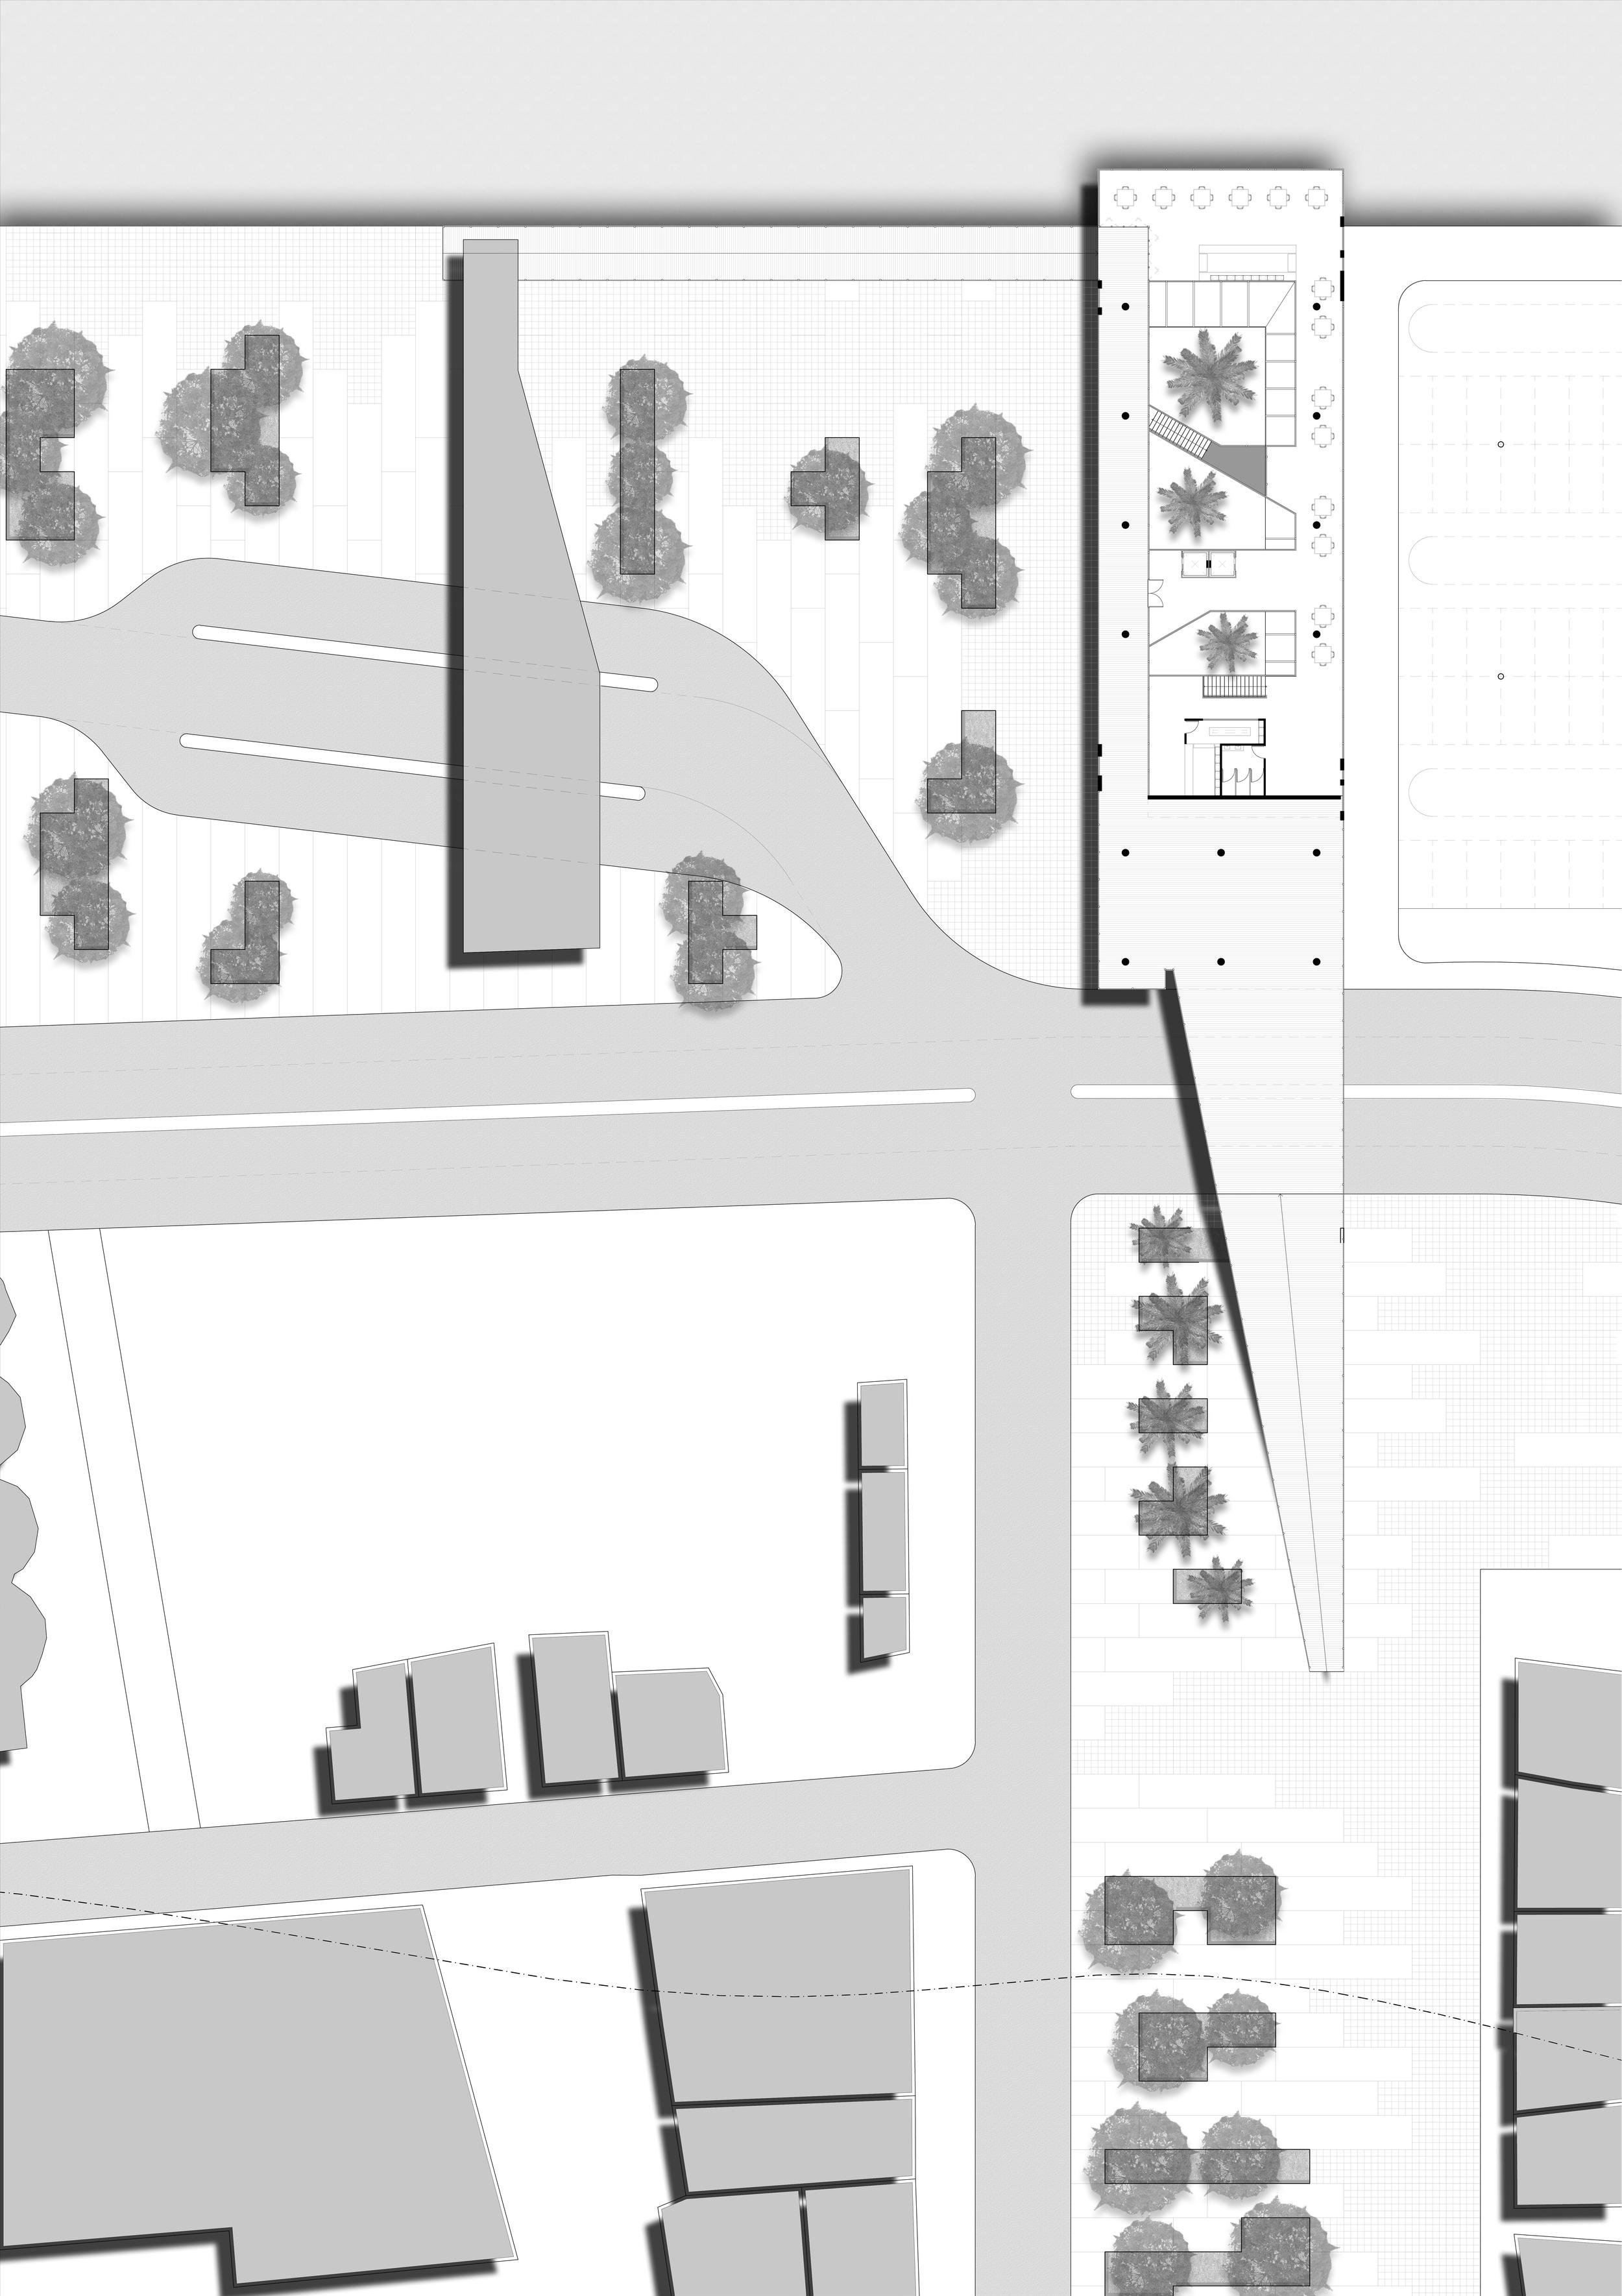 Final_Presentation_Diplwmatikh_Kthrio_No3_Plans_Sections_Elevations_Floor_Plan_+0800.jpg